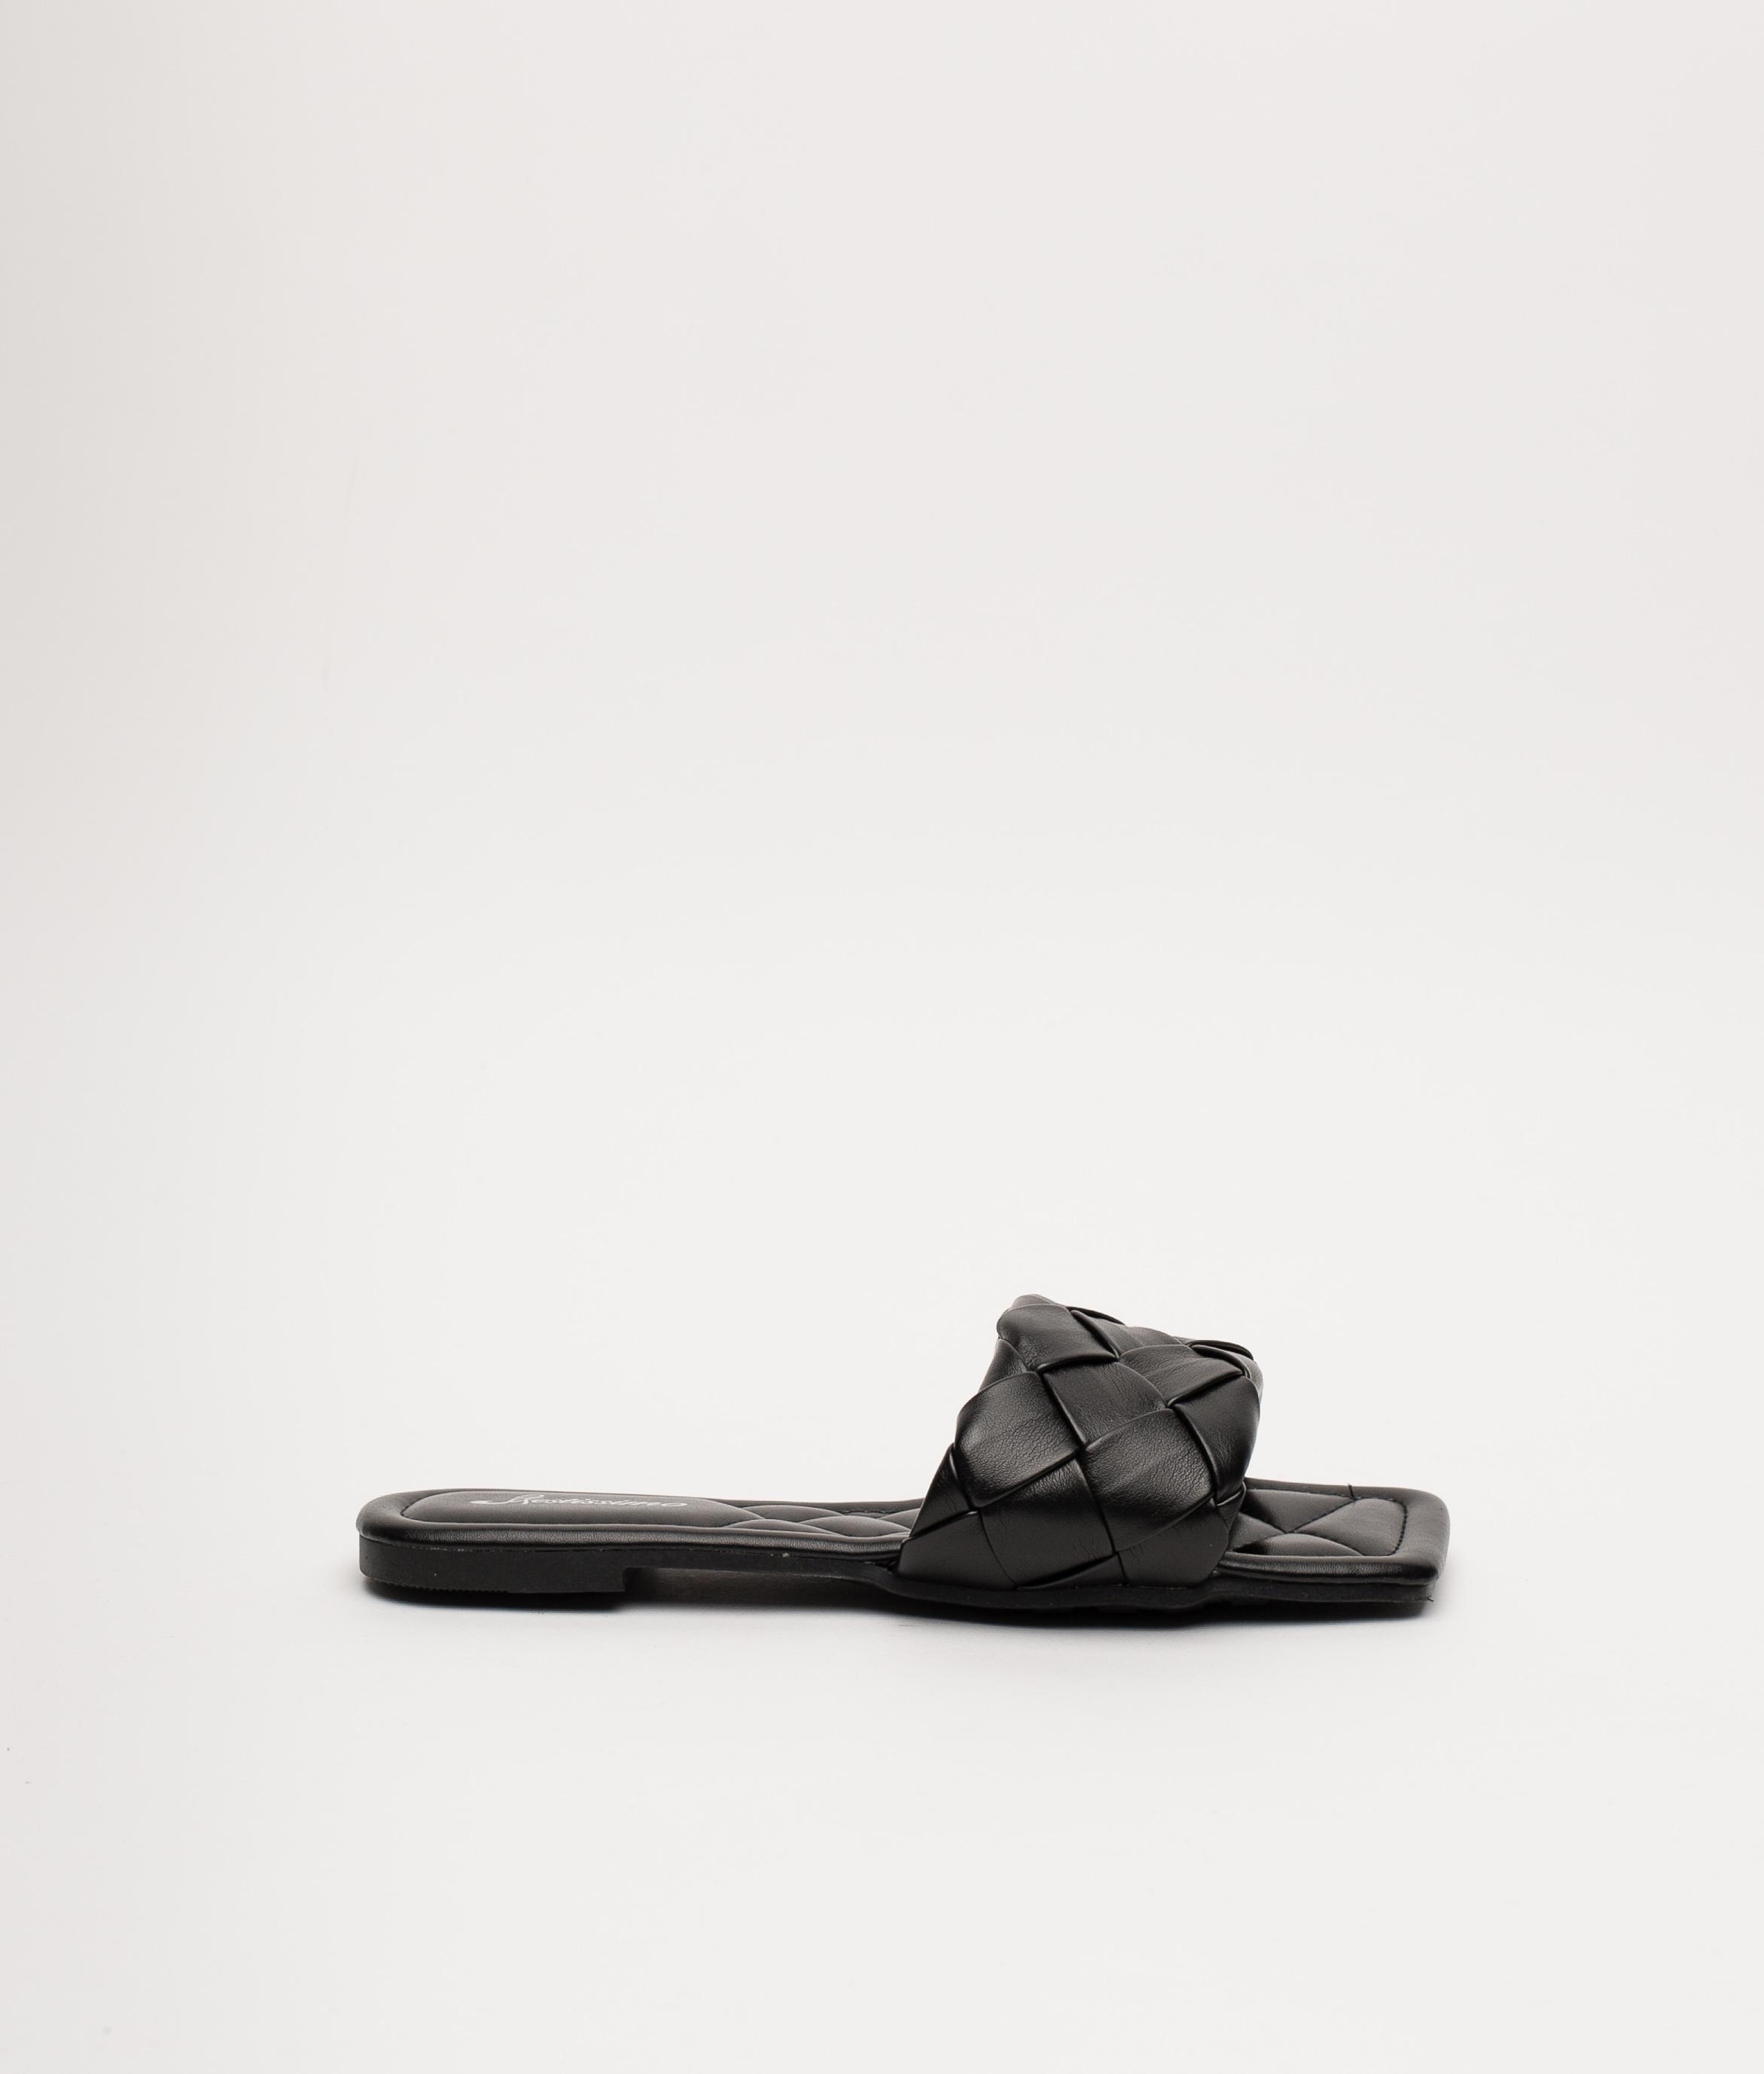 SORATA SANDAL - BLACK